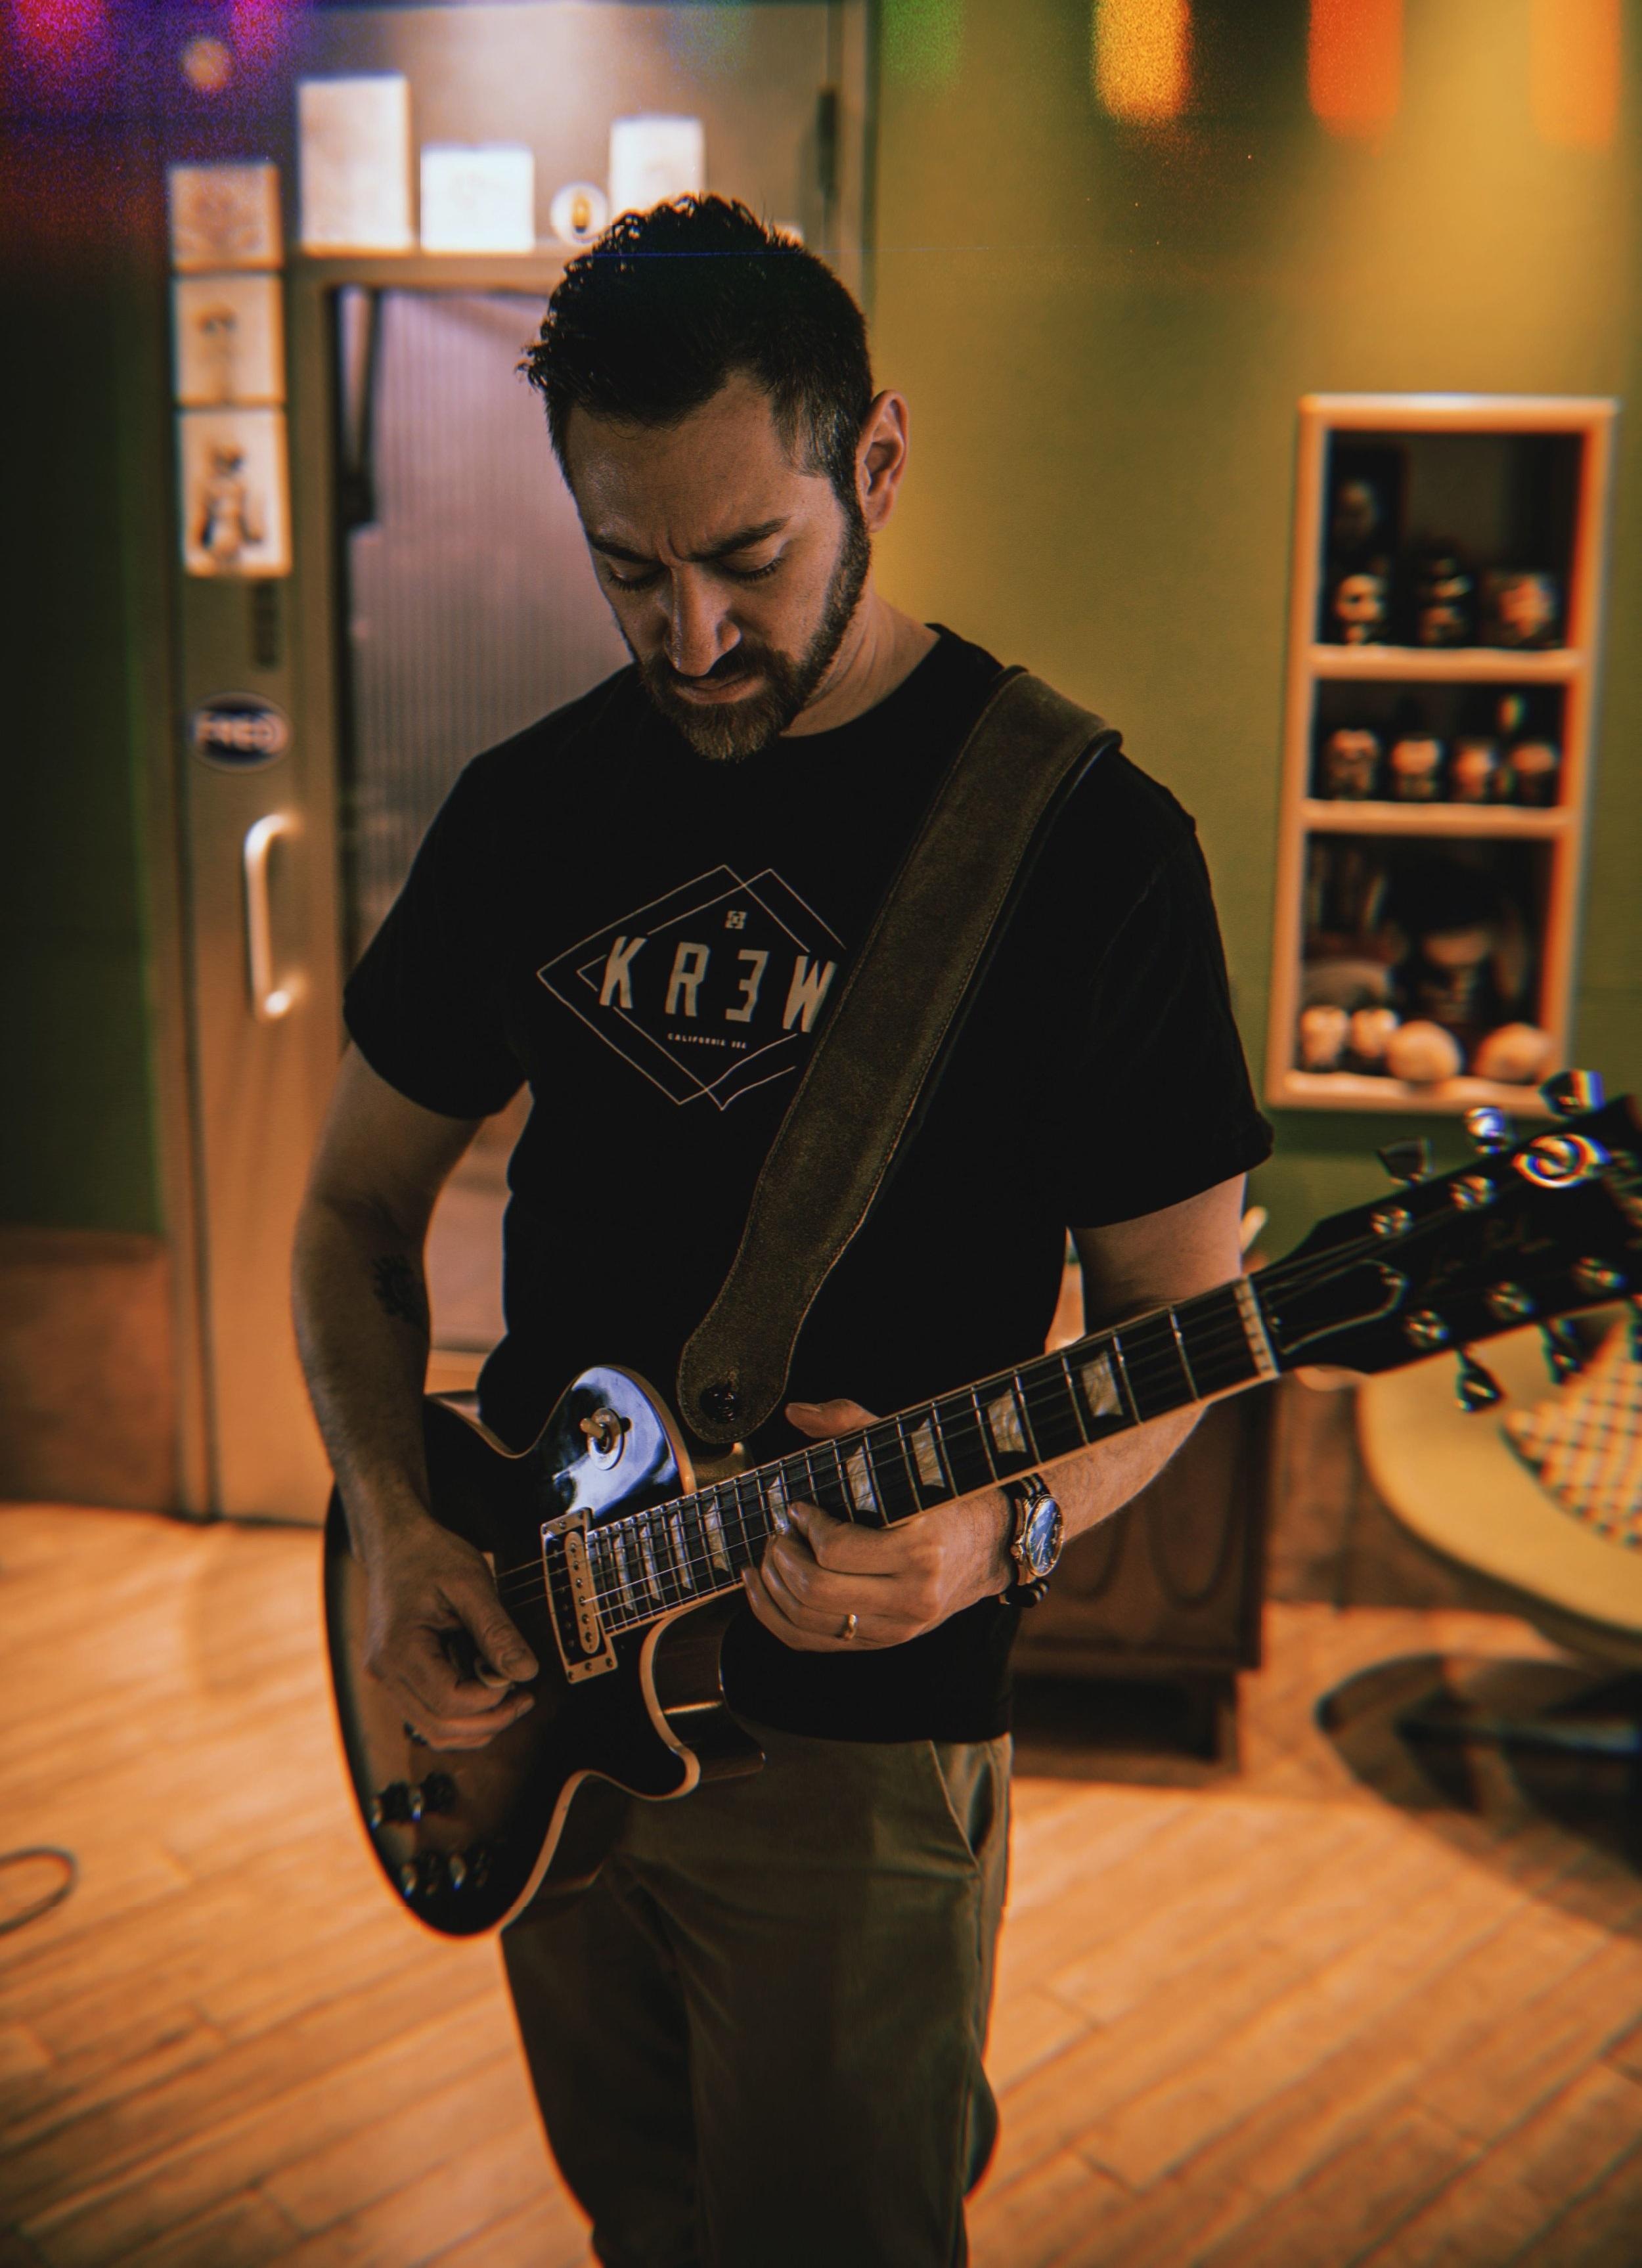 Paul Weiss - Sound Designer/Mix Engineer